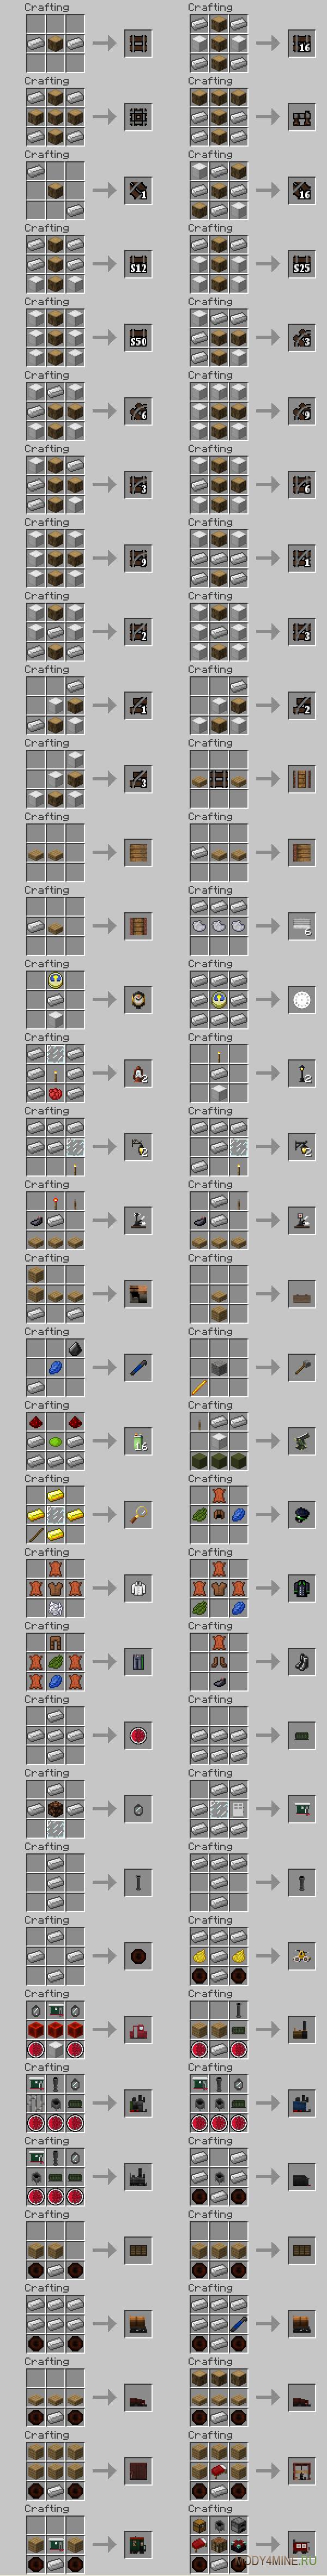 rails-of-war-craft